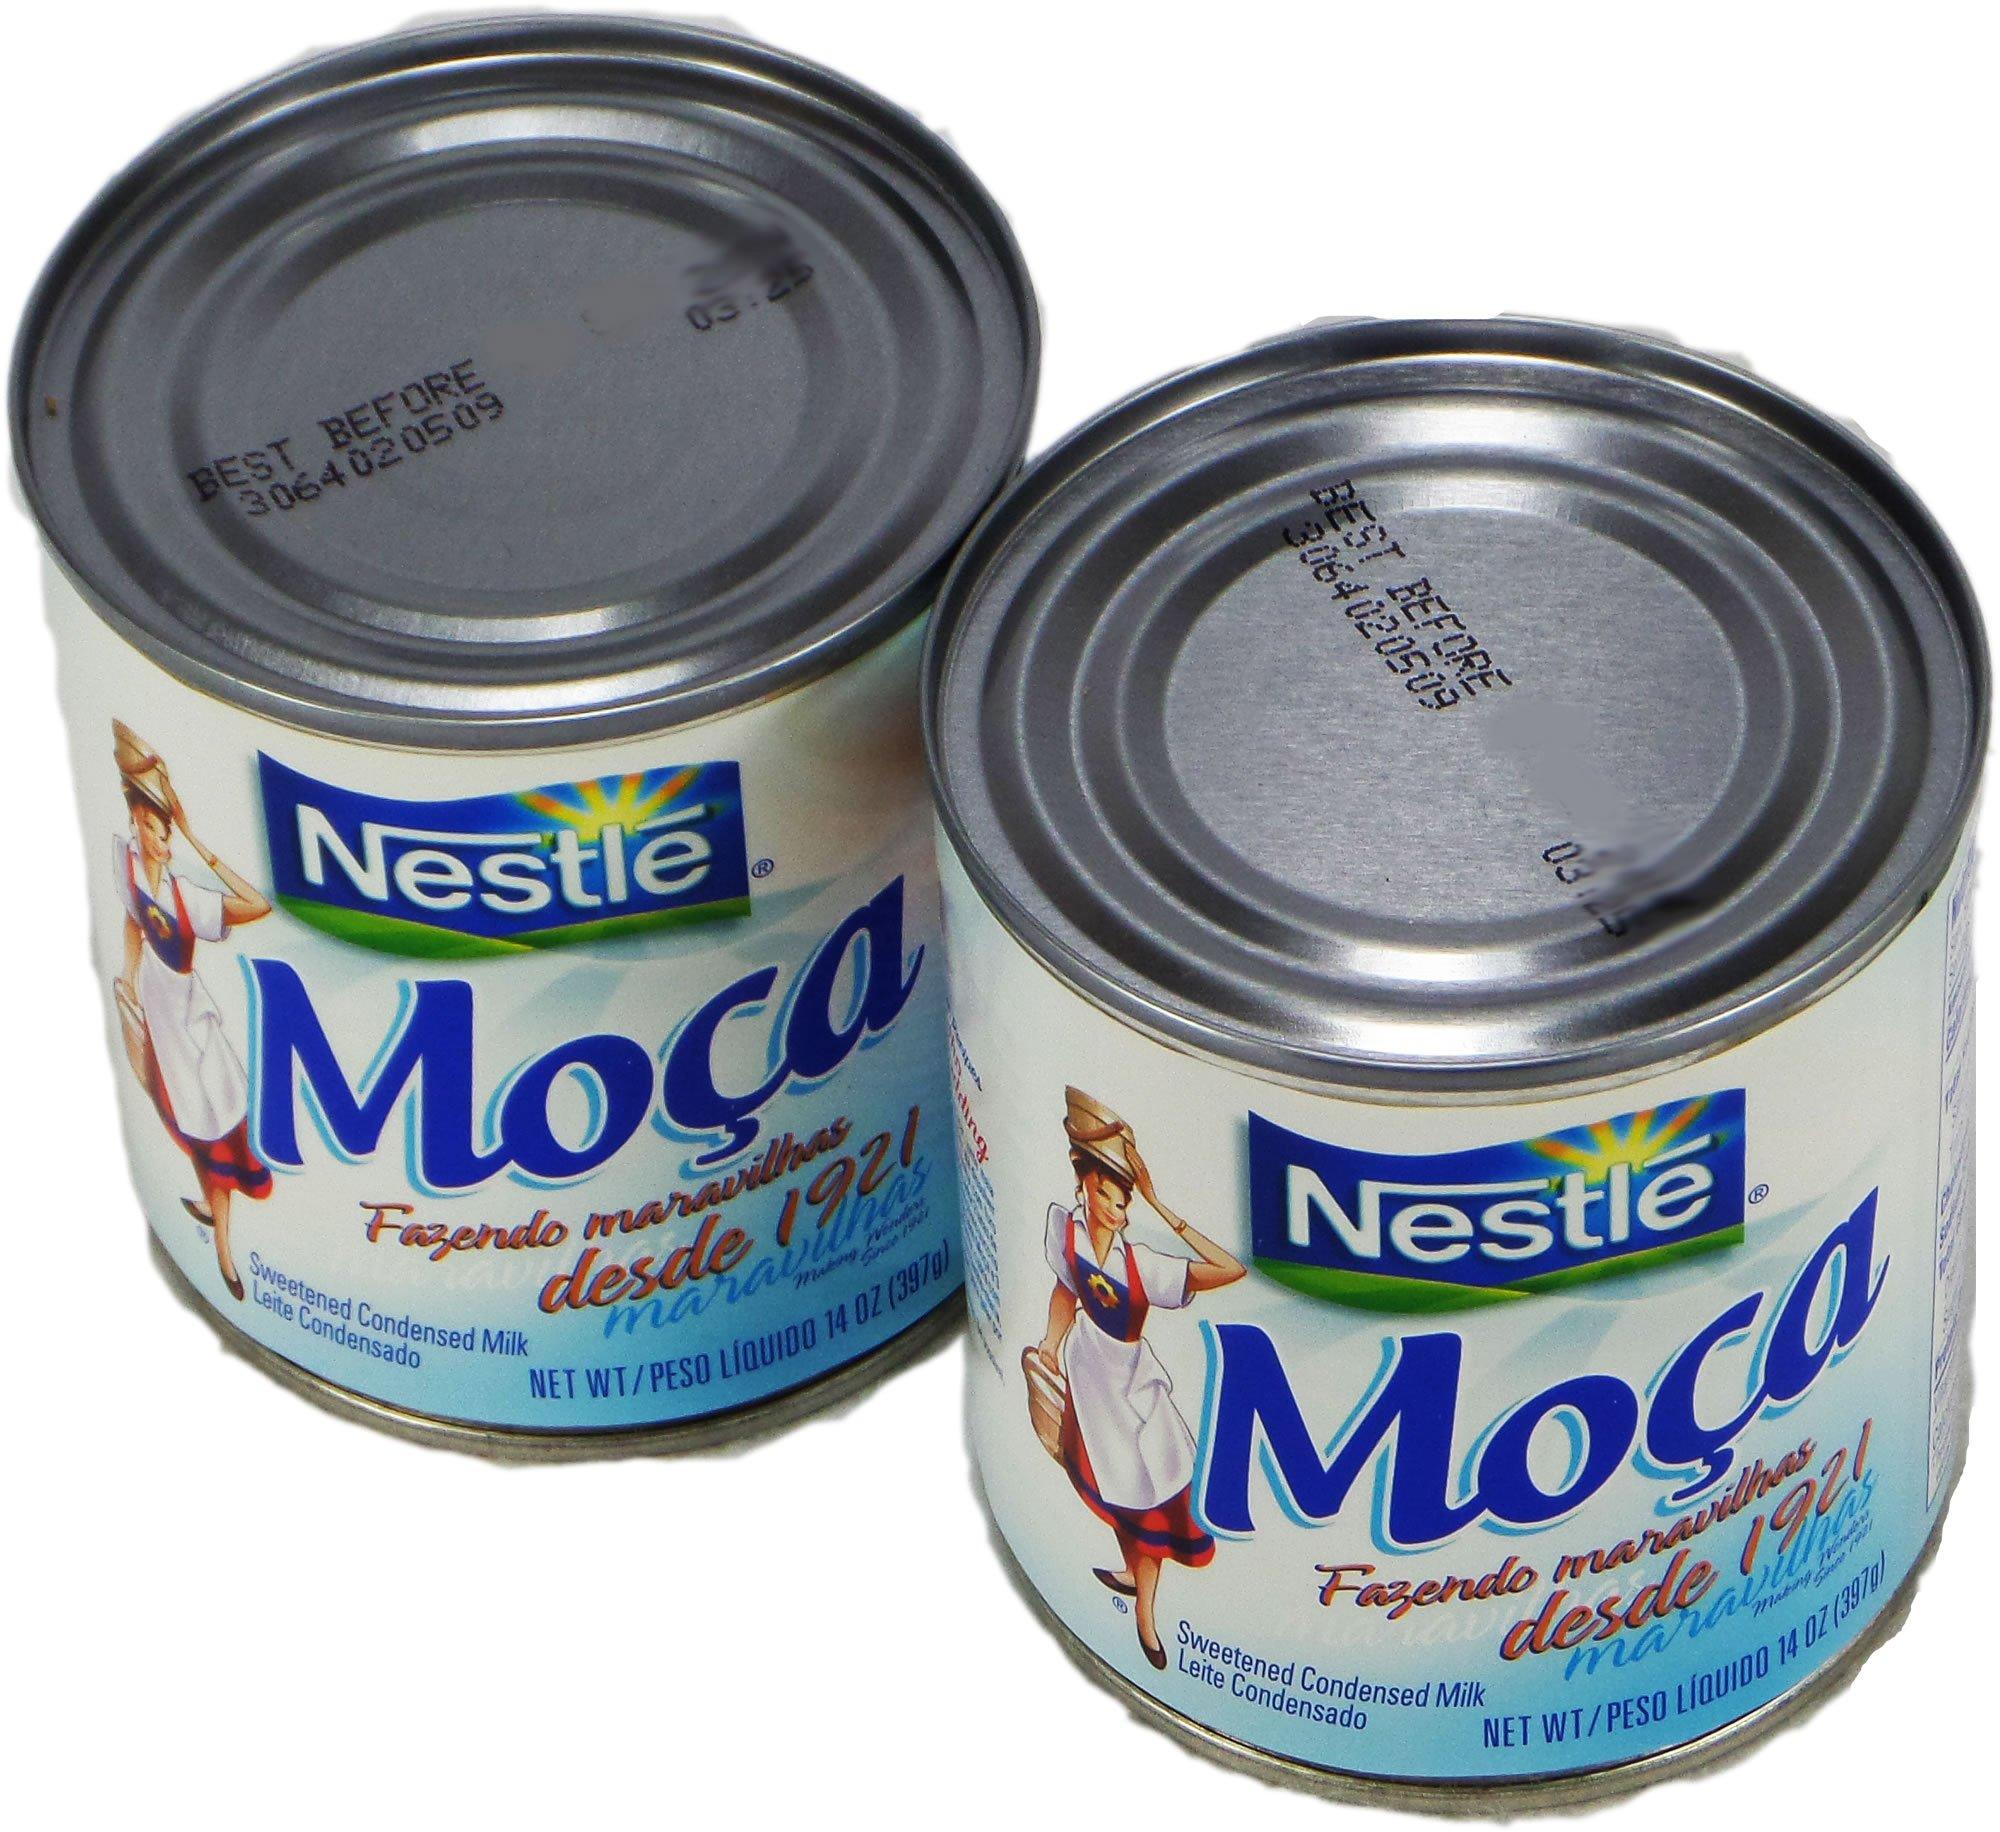 Nestlé Moça Leite Condensado 397g | Sweetened Condensed Milk 14oz. (Pack of 02)